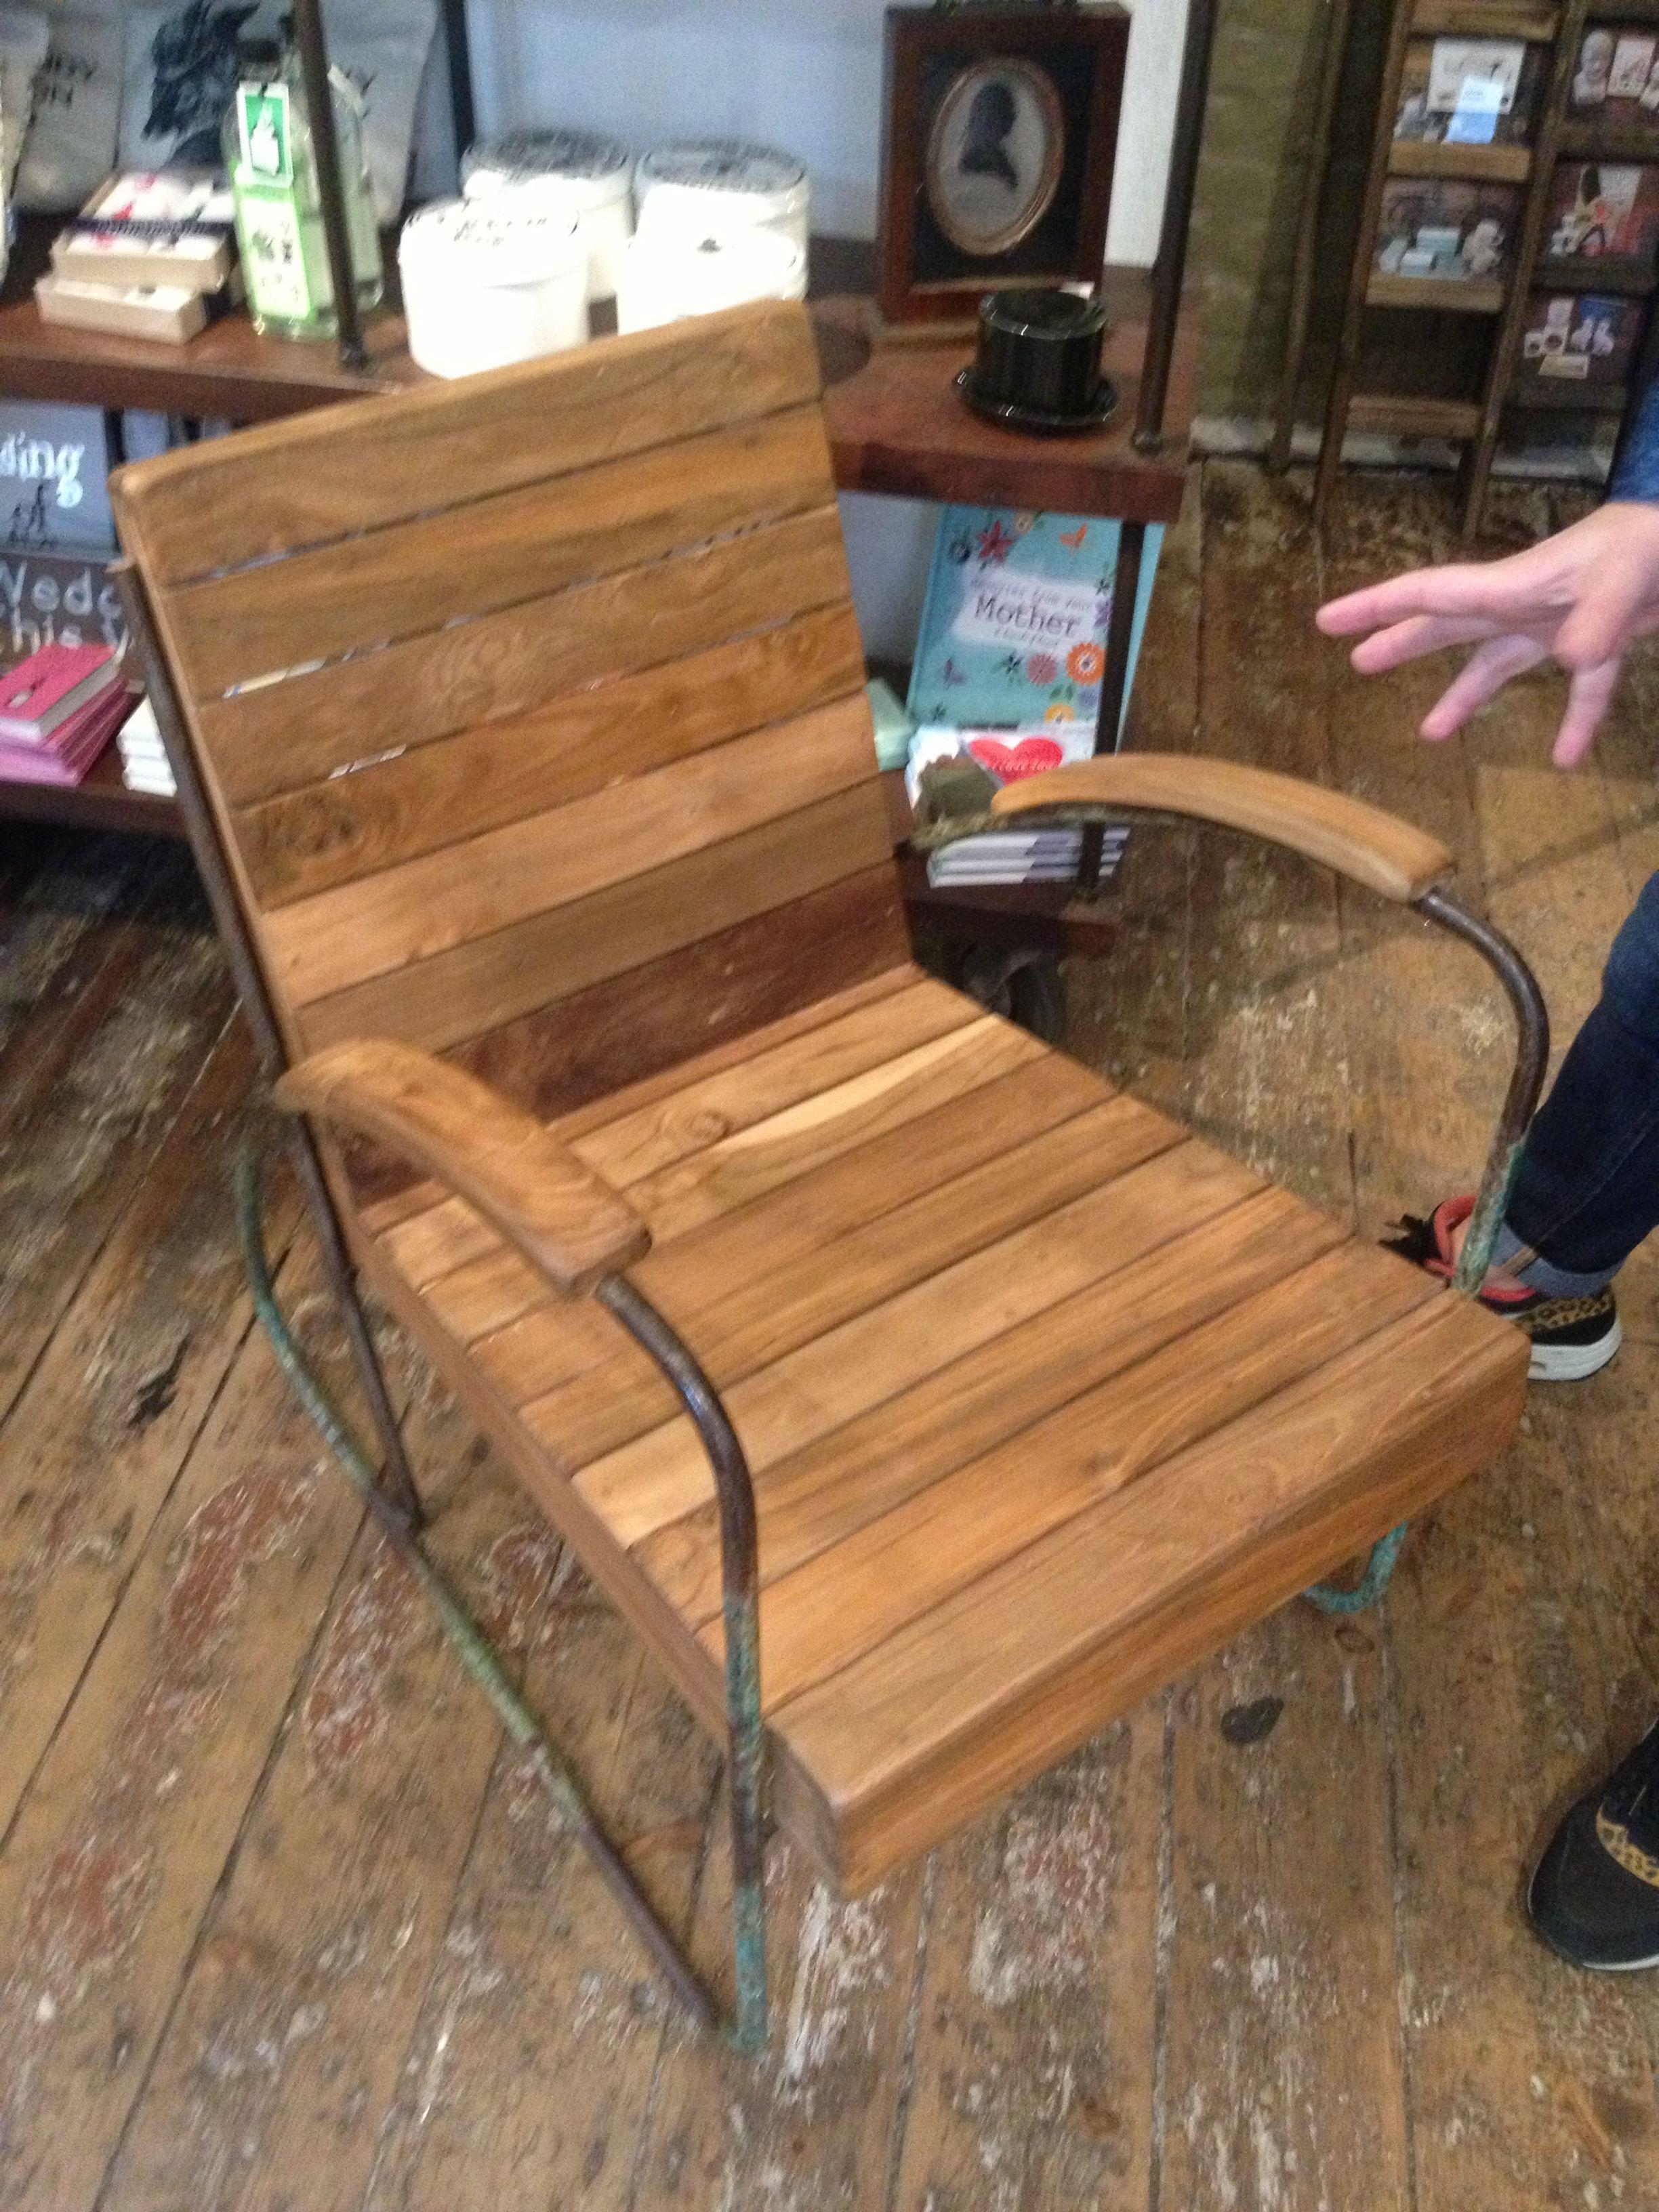 10x10 Grow Room Design: Wooden Chair, Chair, Wooden